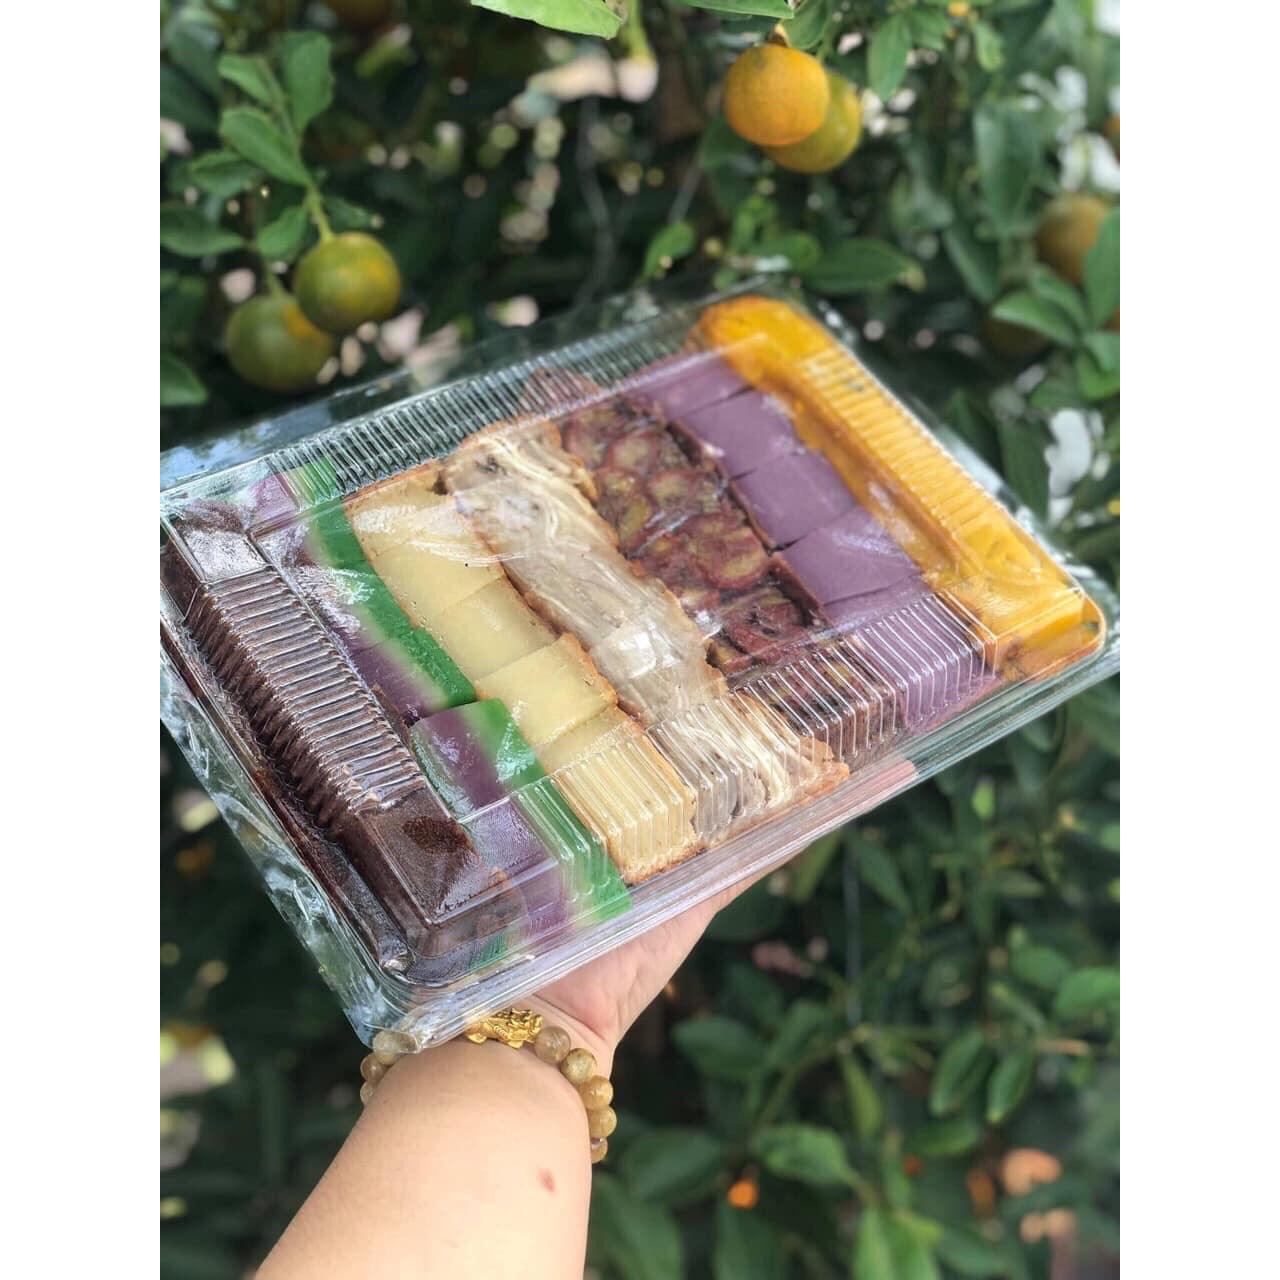 Mixed muffins (Small tray)